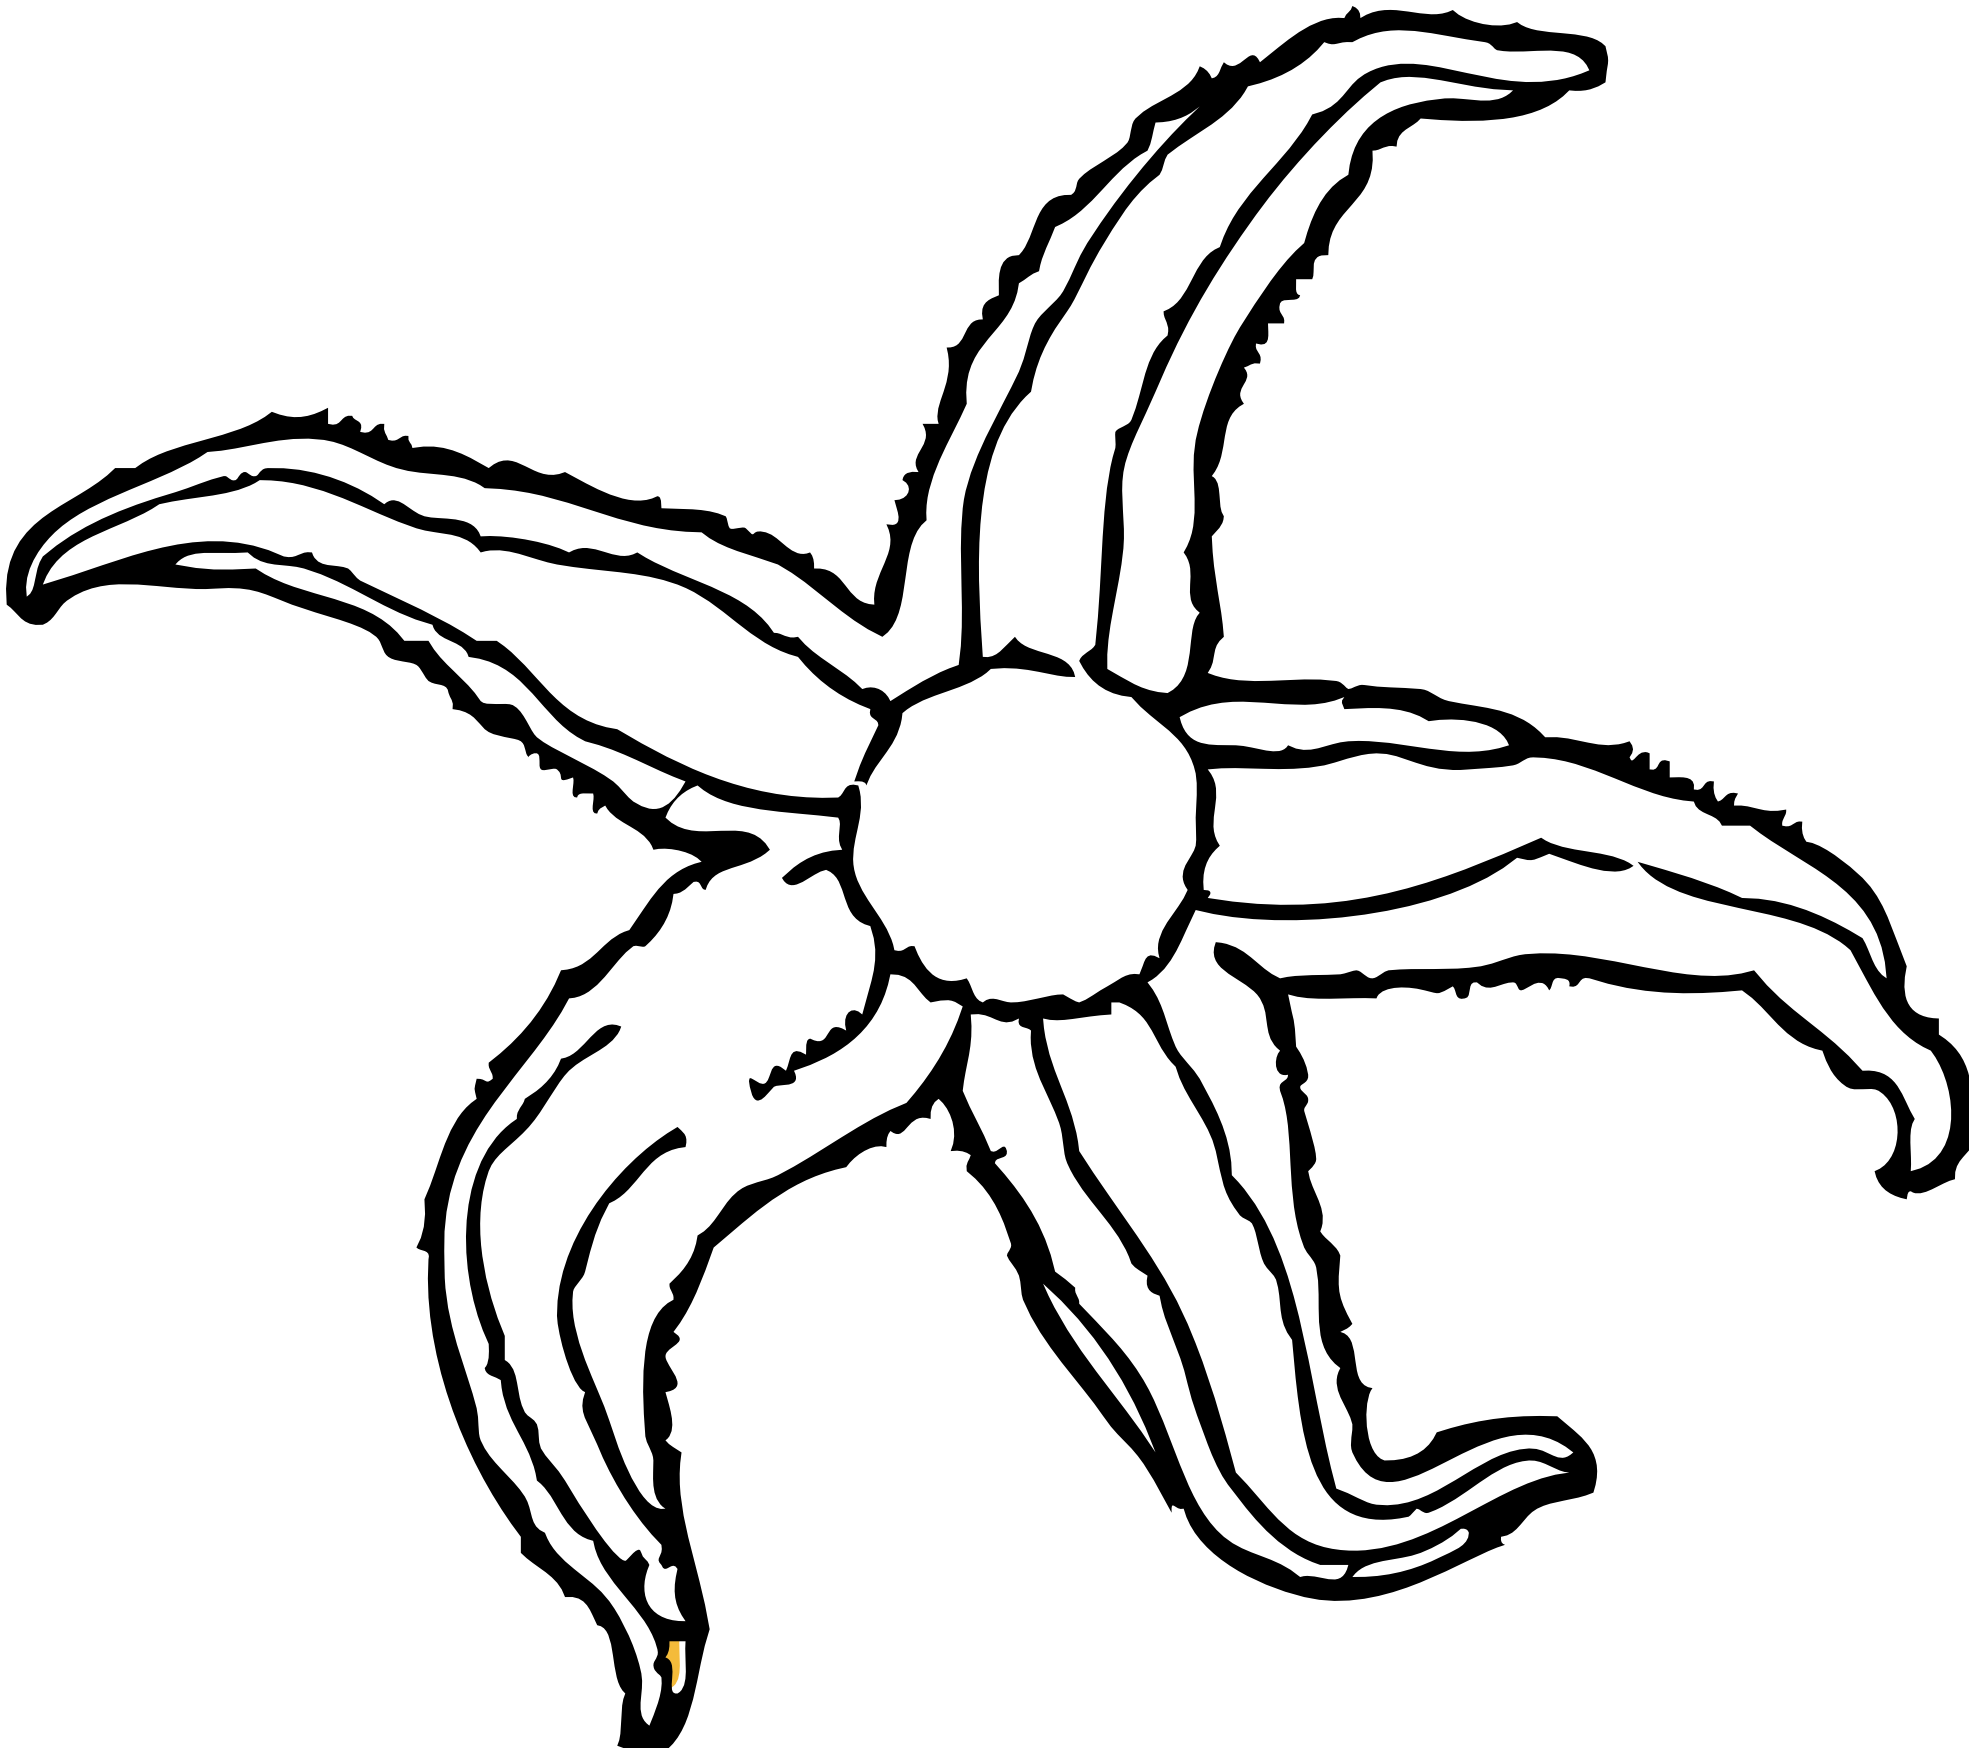 1969x1748 Seahorse Clipart Black And White Clipart Panda